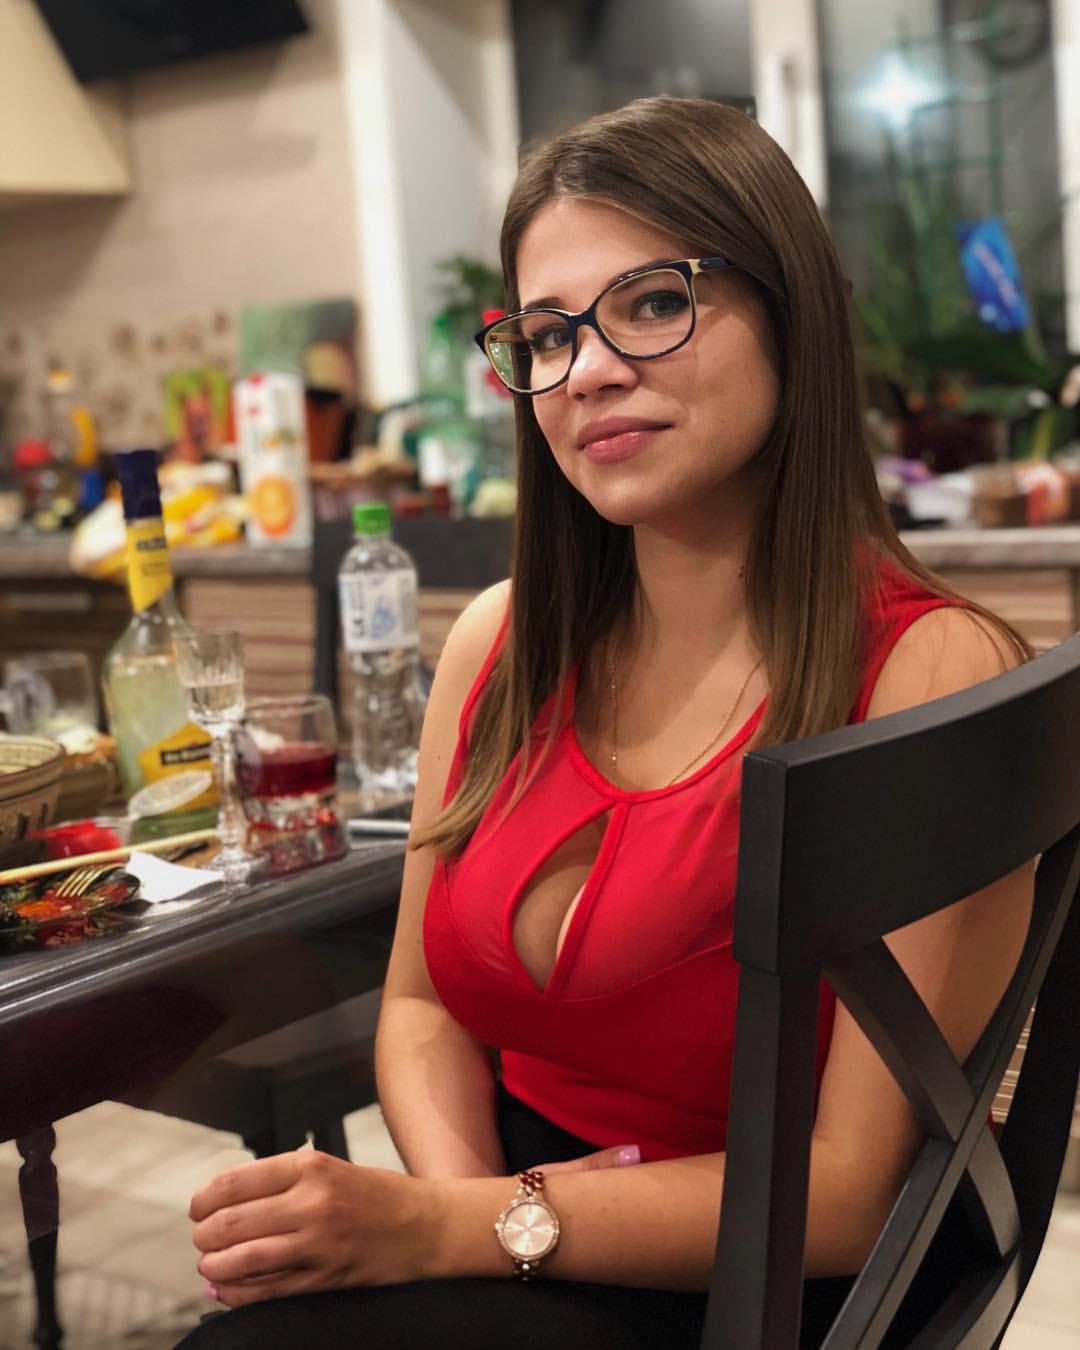 Busty Russian Women: Anastasia K